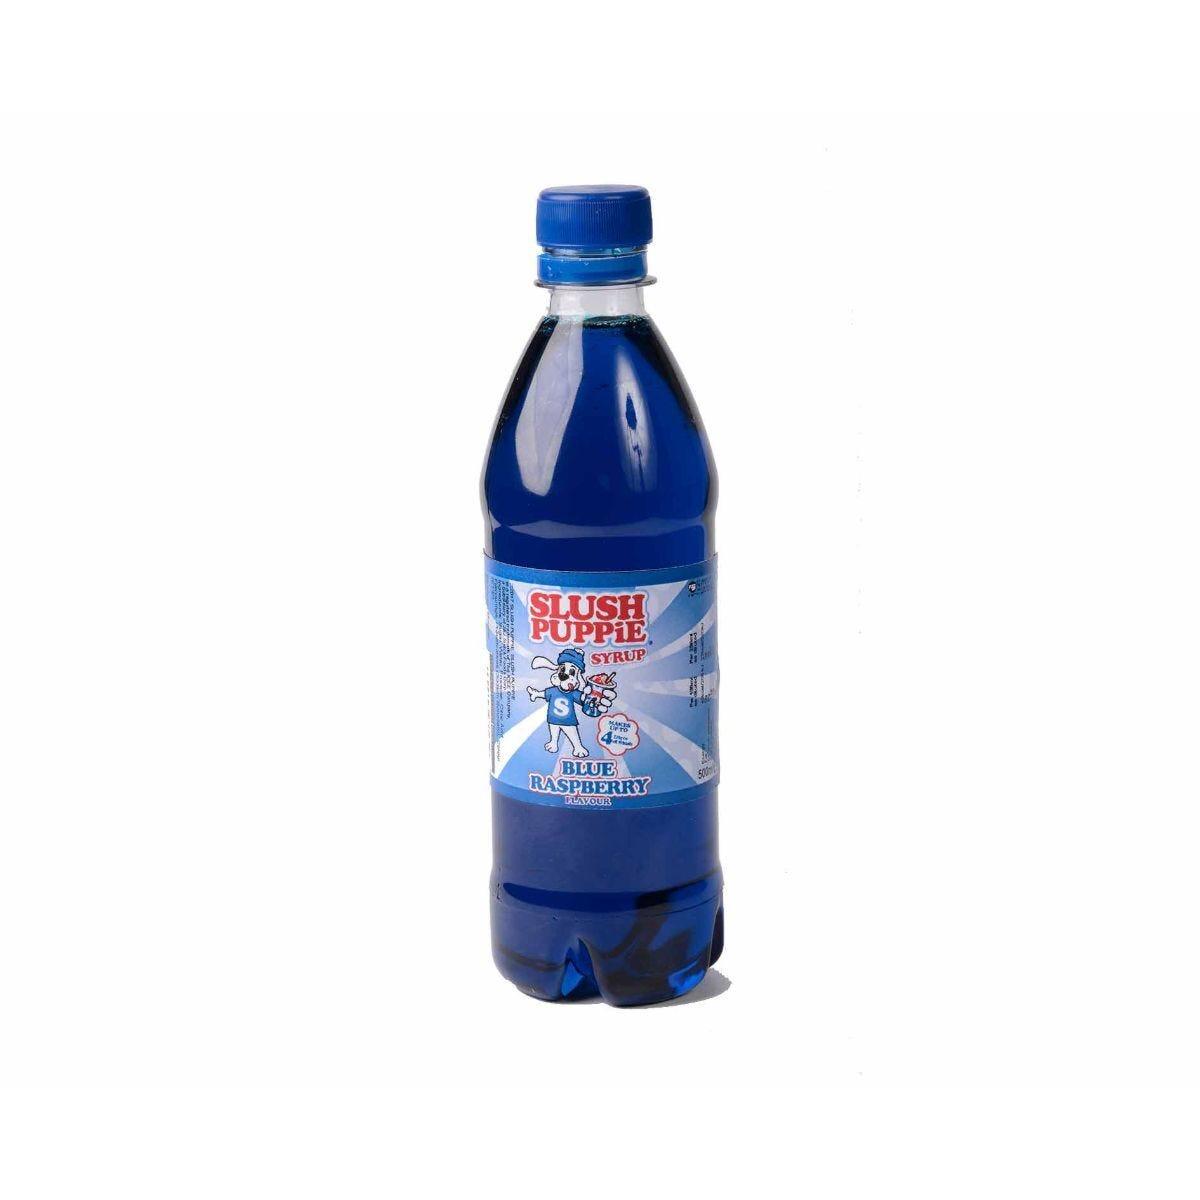 Slush Puppie Syrup Blue Raspberry